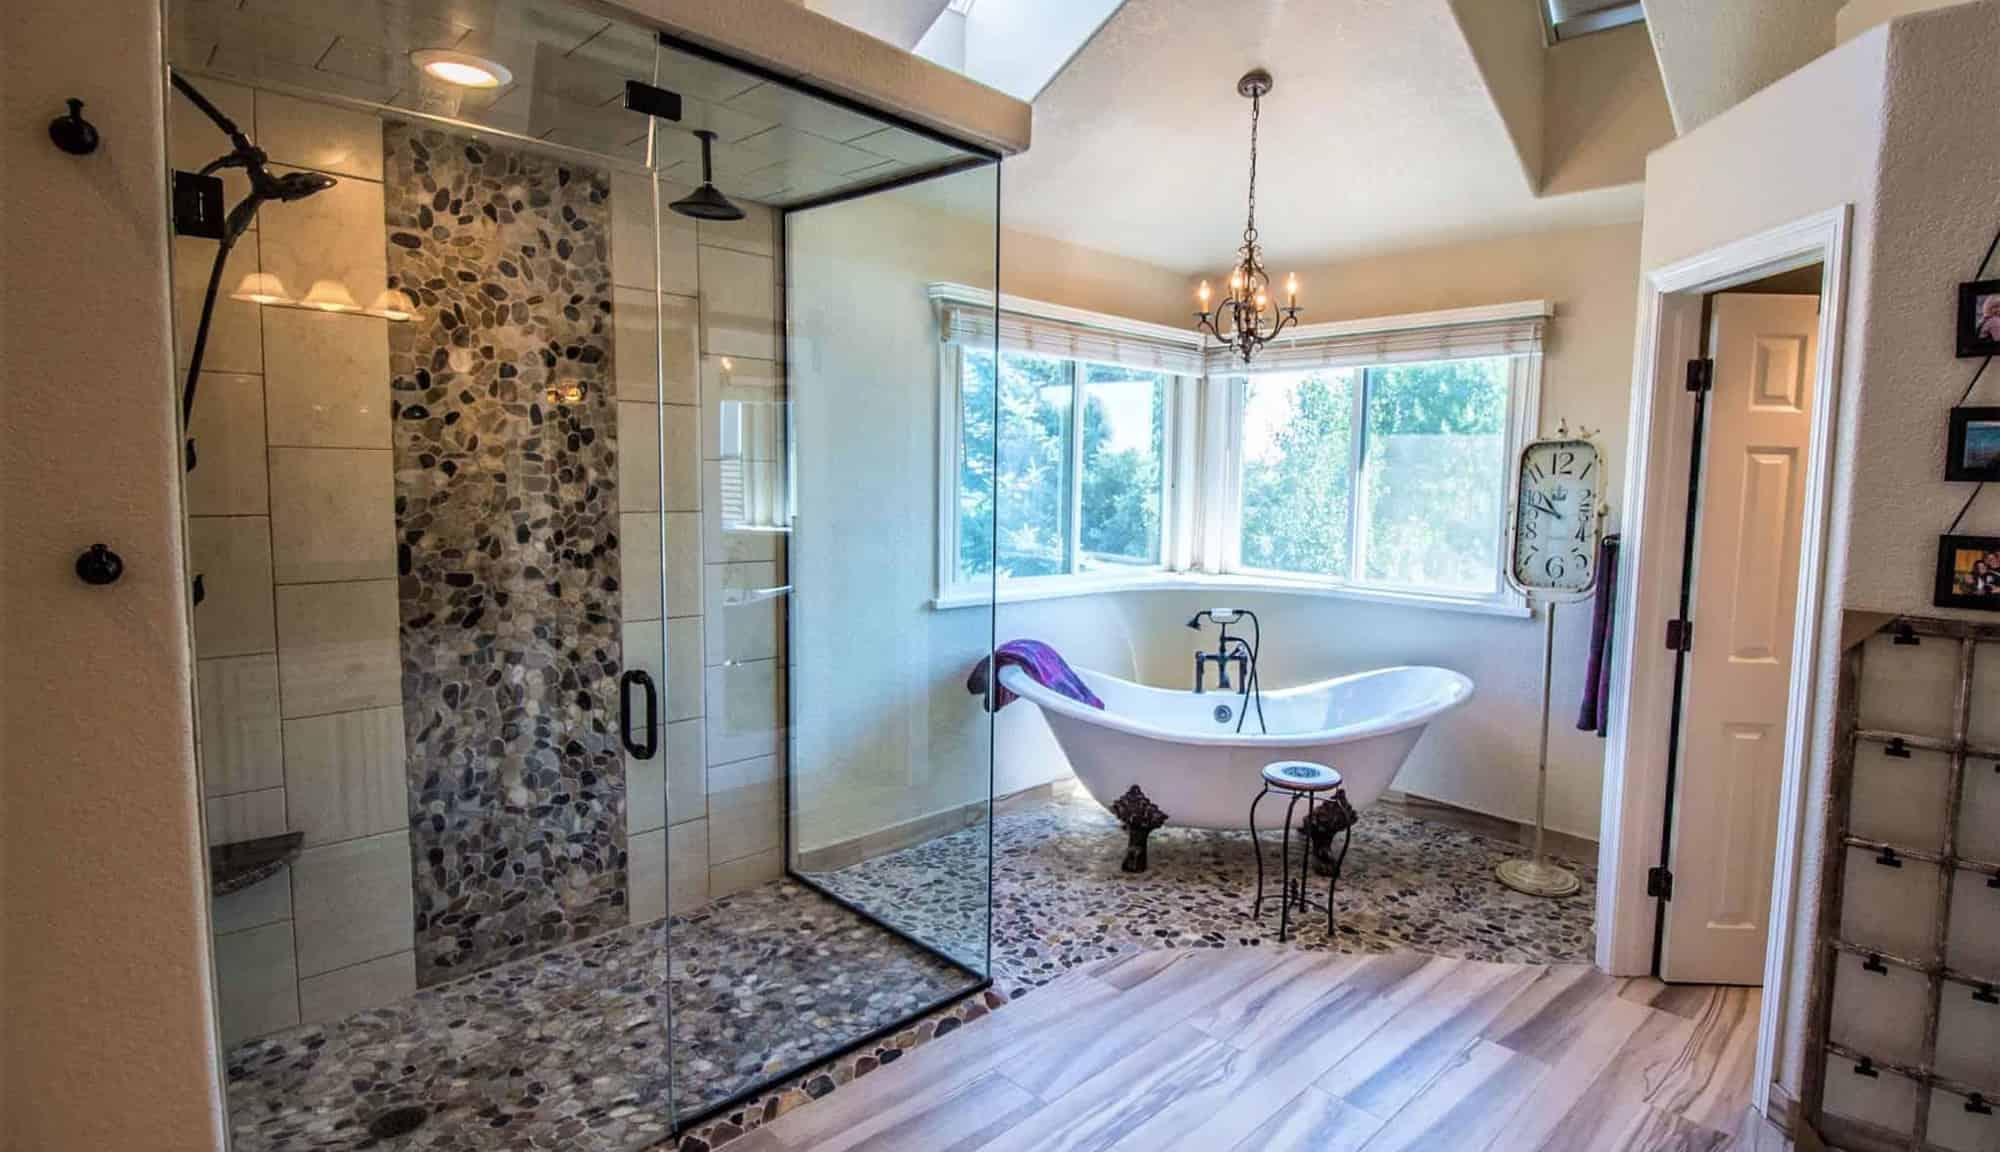 Full bathroom remodel by FGS in Centennial, Colorado